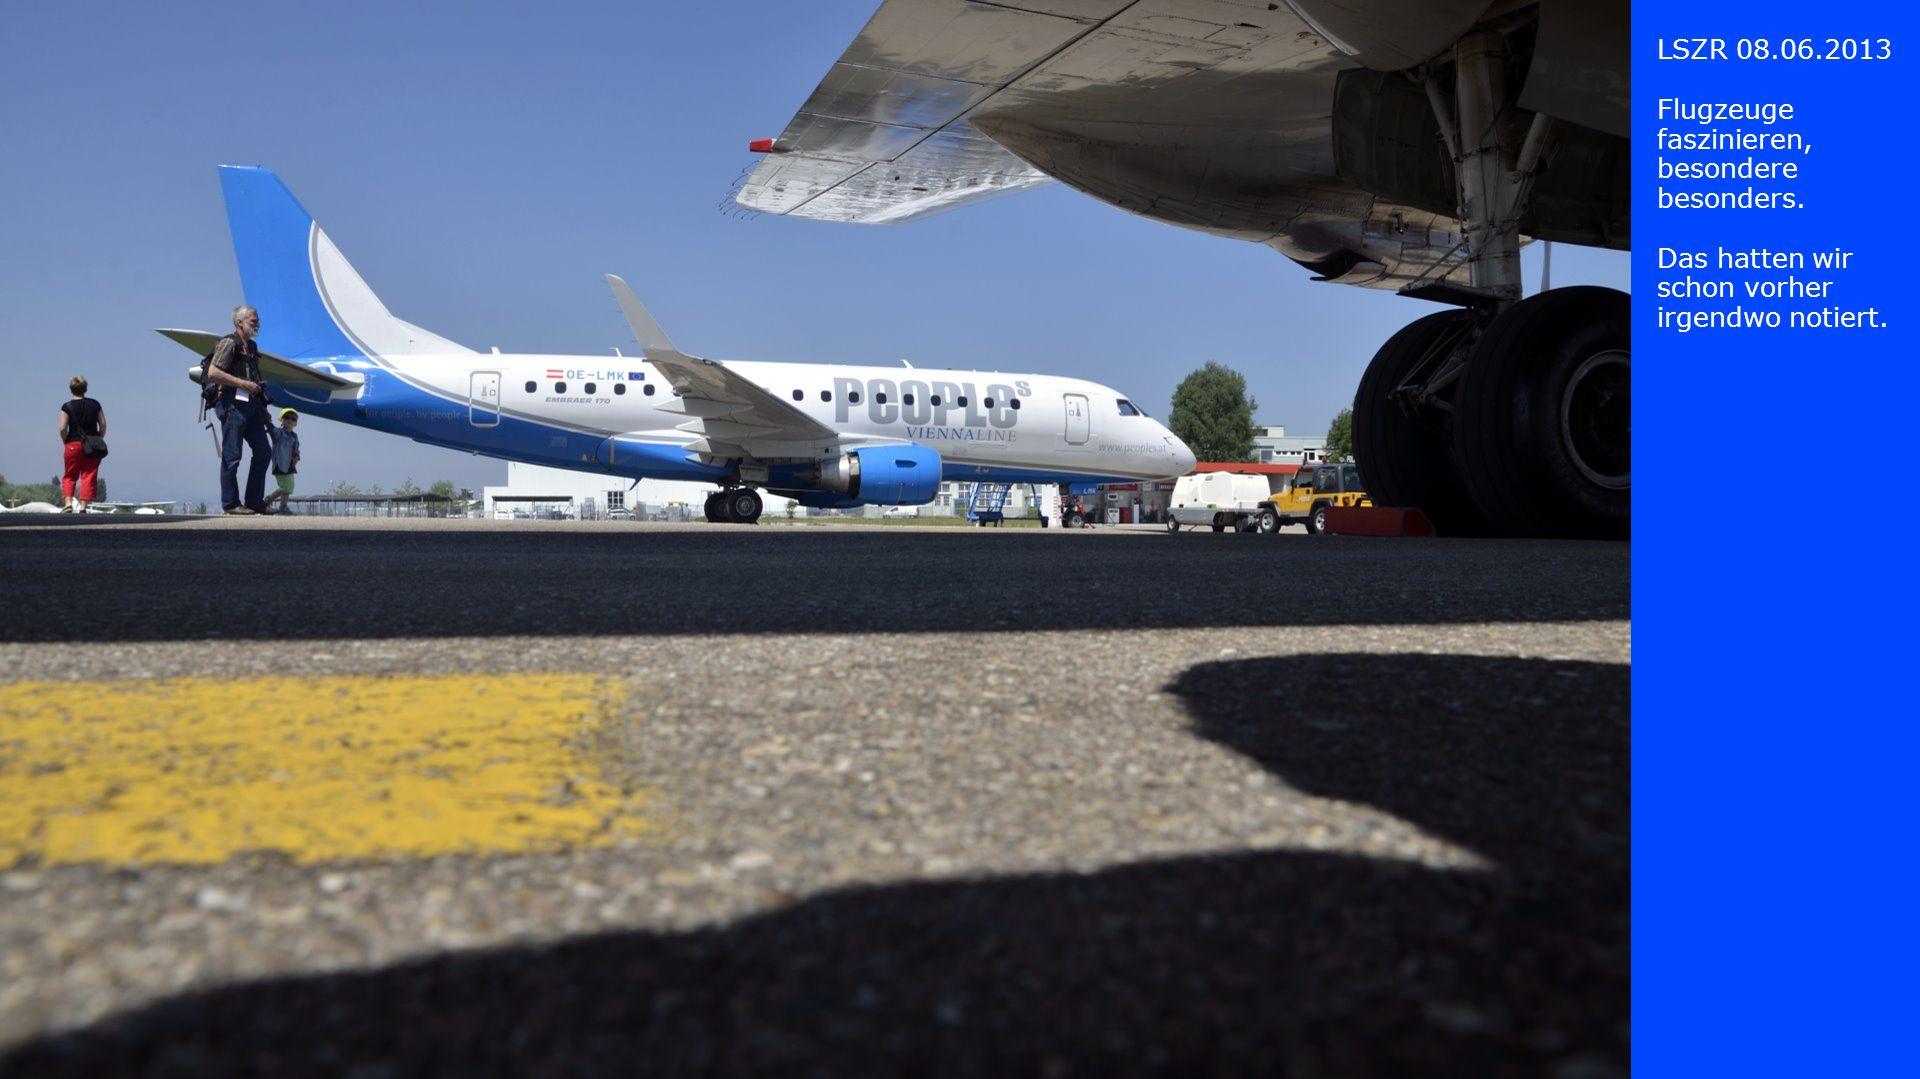 LSZR 08.06.2013 Flugzeuge faszinieren, besondere.